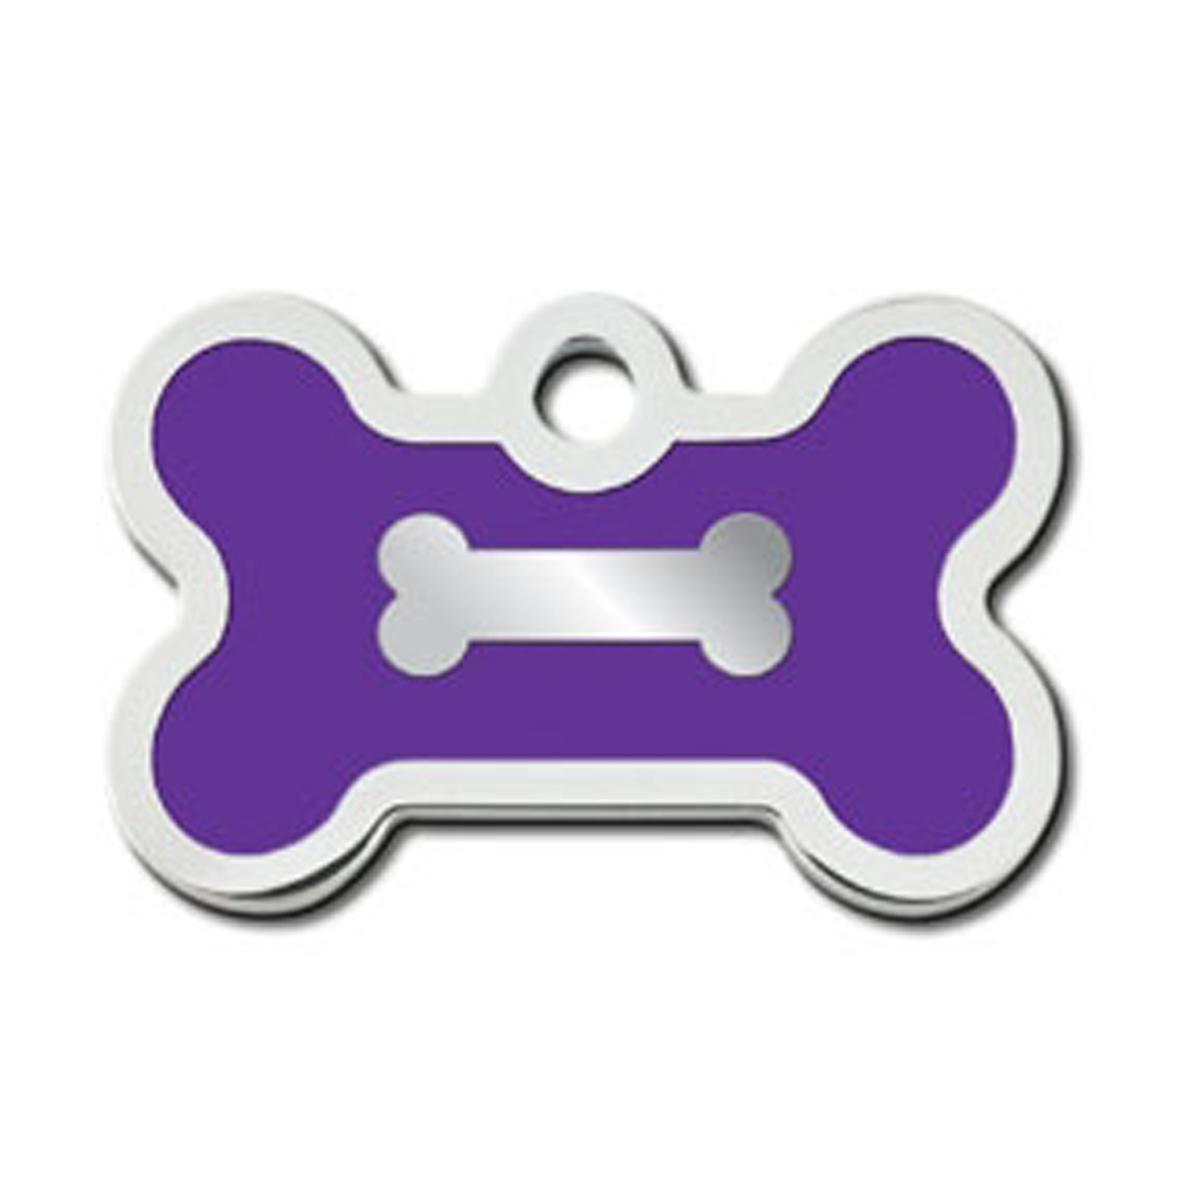 Bone Small Engravable Pet I.D. Tag - Chrome and Purple